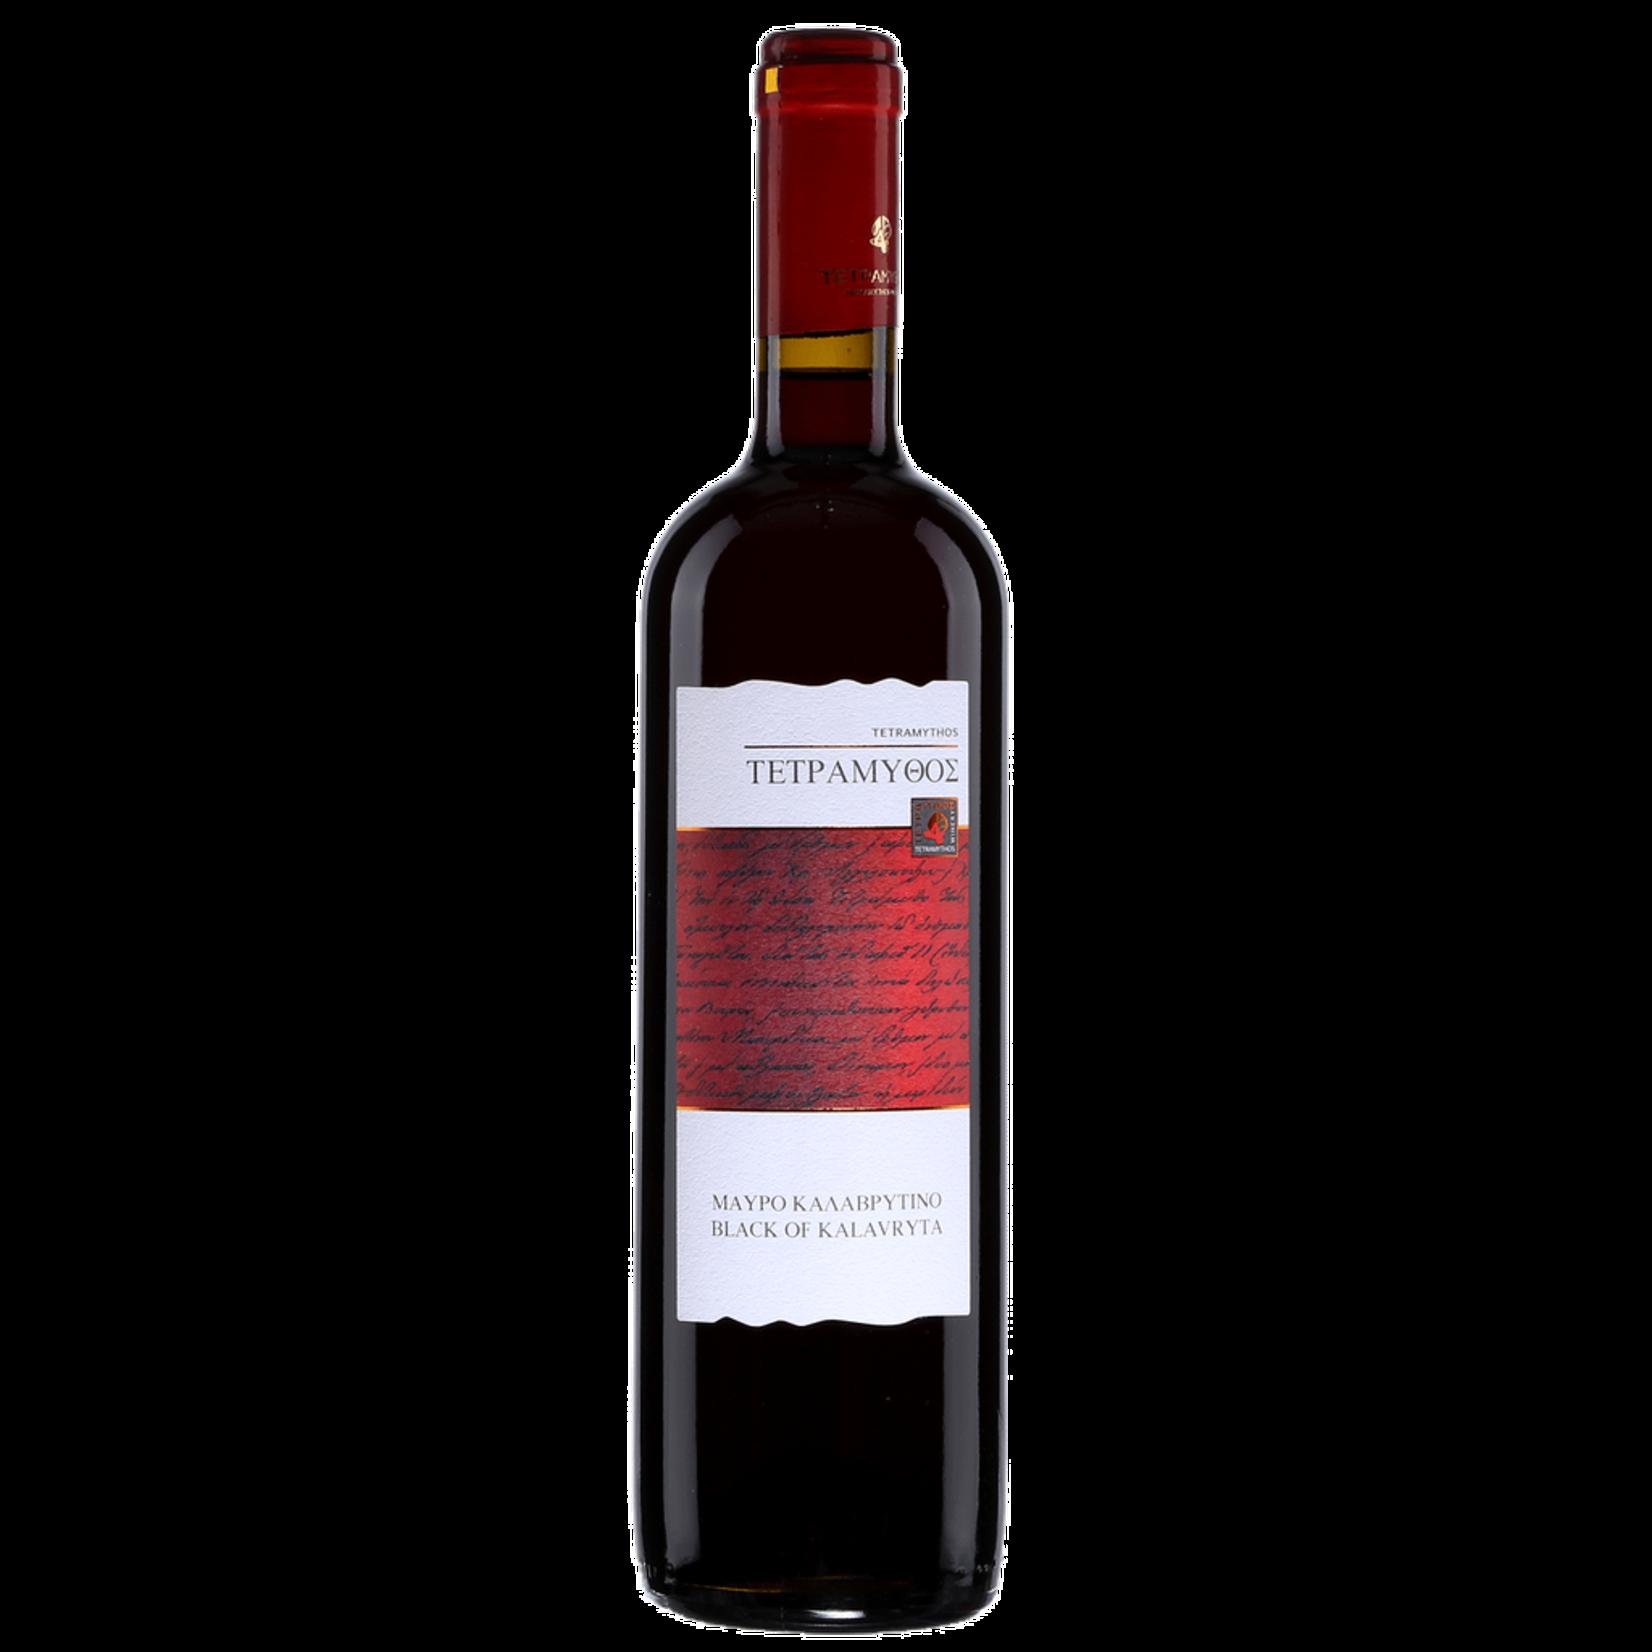 Wine Tetramythos Achaia Black of Kalavryta 2018